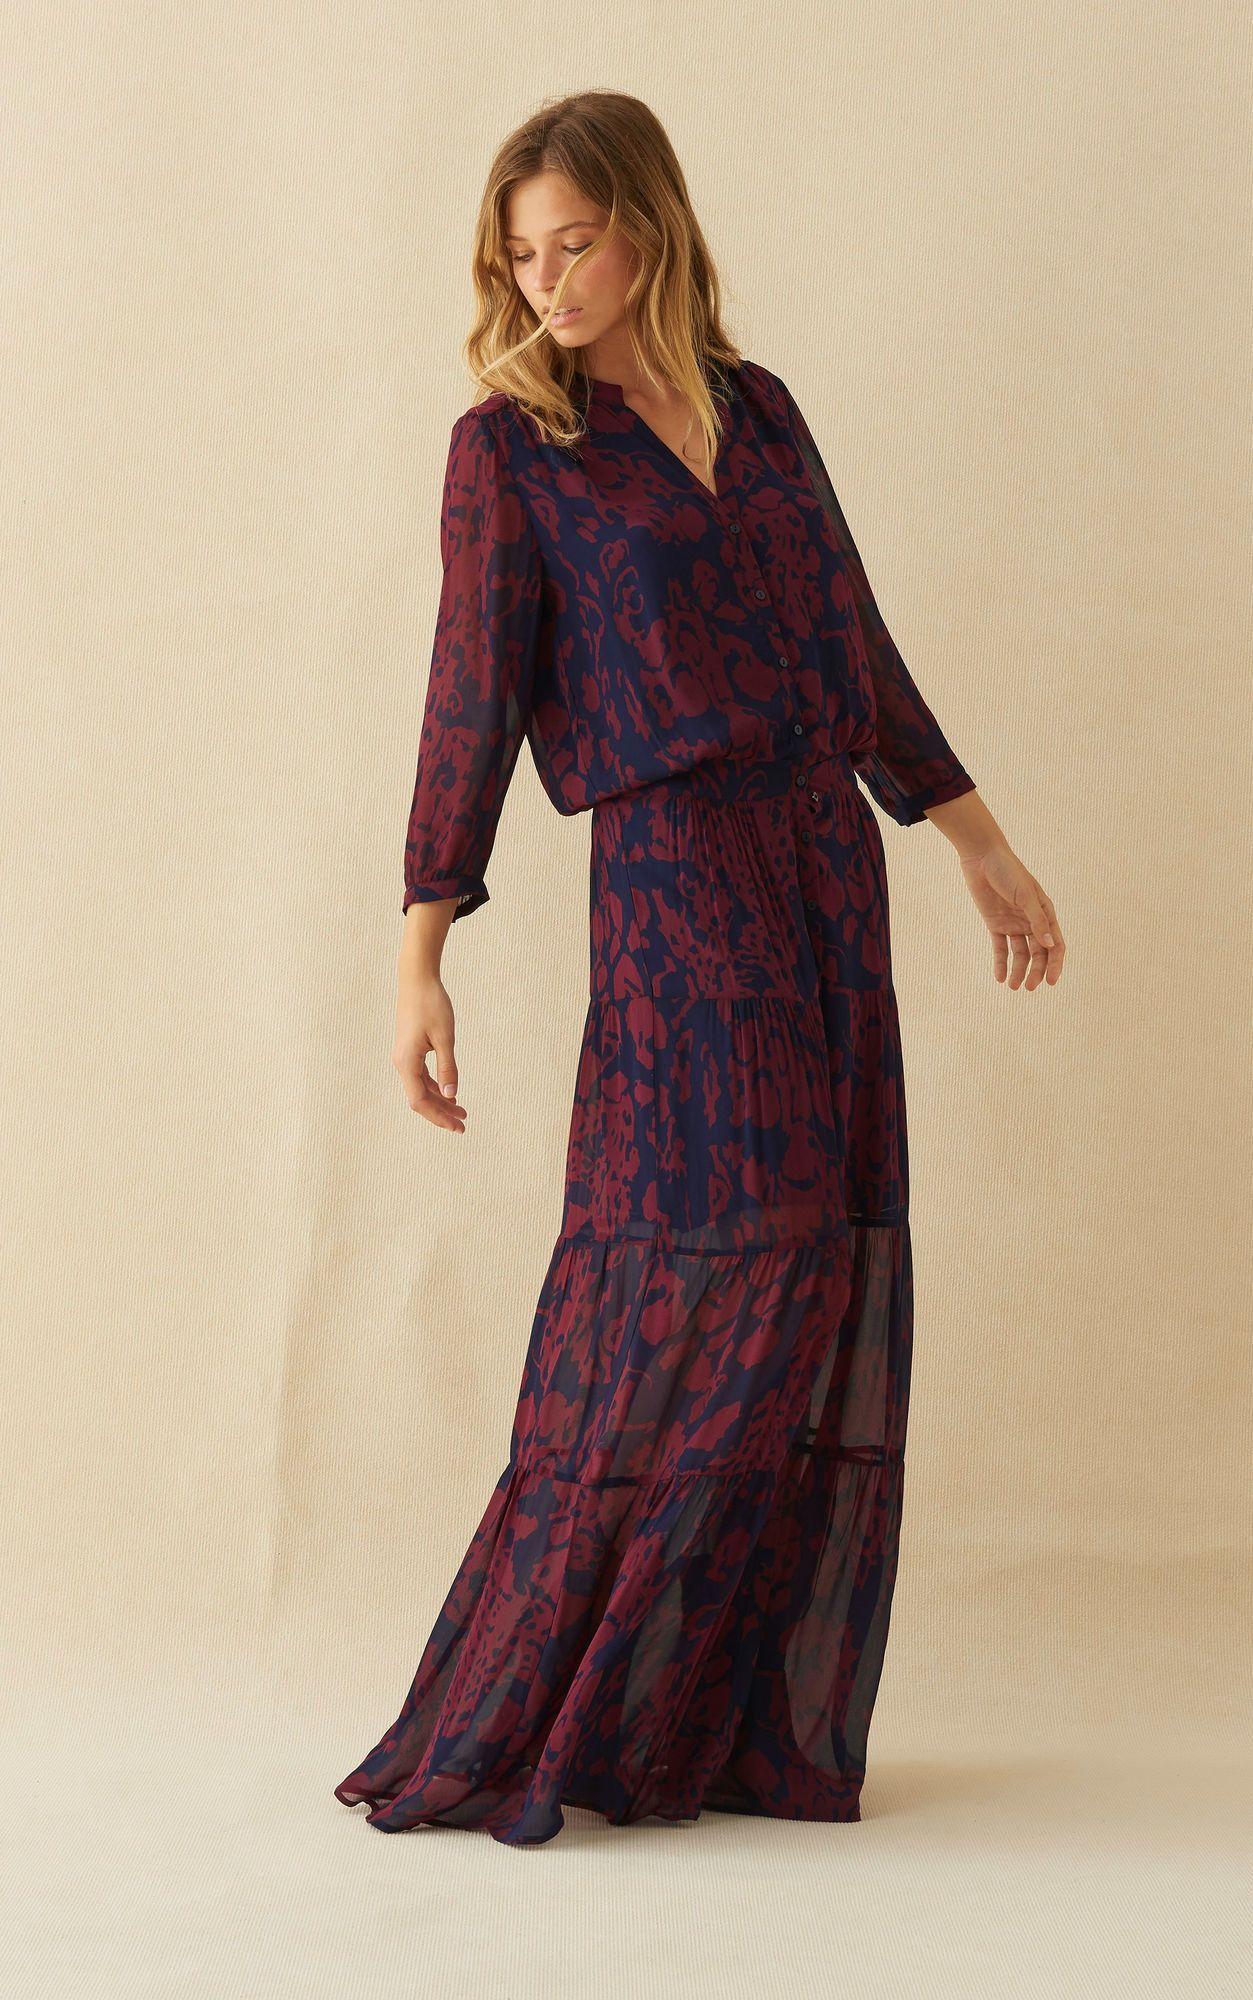 ROBE BLAKE MARINE ba&sh | Lange jurken, Herfst outfit ideeën